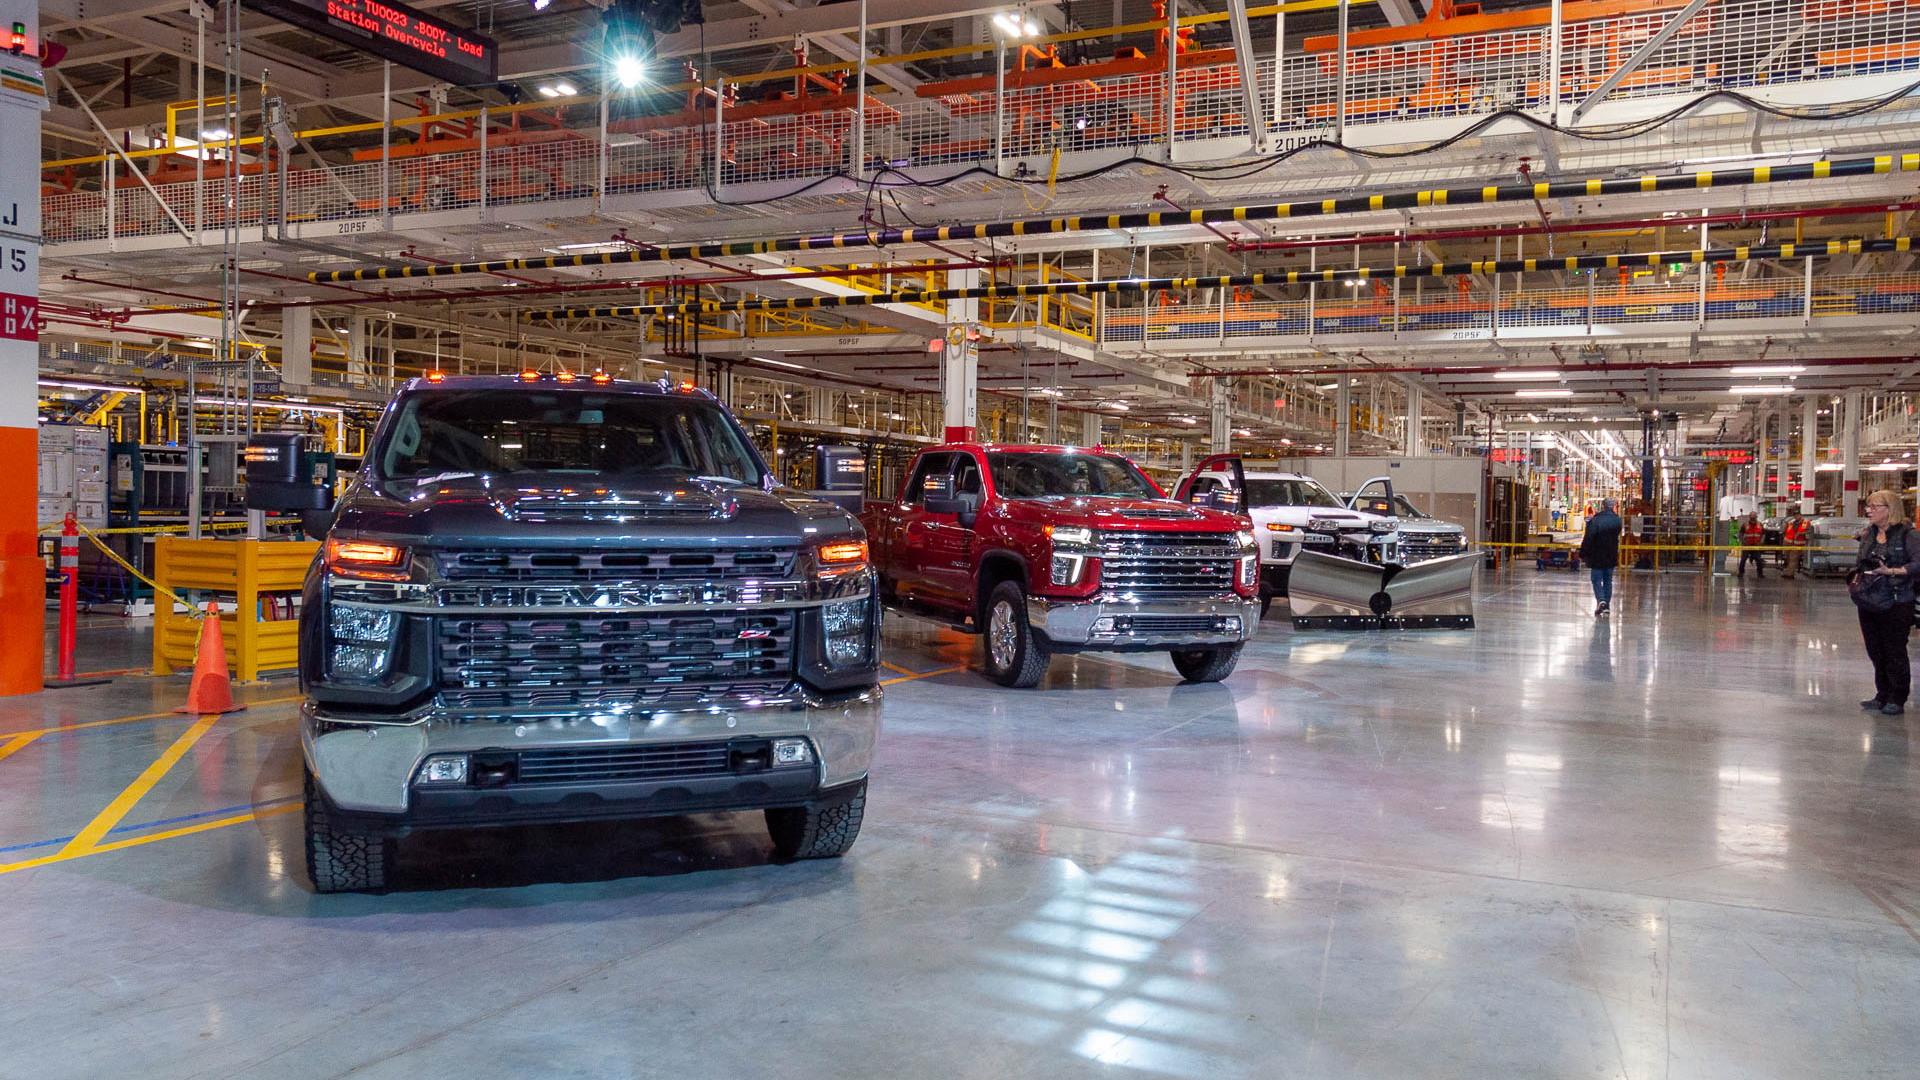 2020 Chevrolet Silverado 2500HD is ready to work: Heavy ...